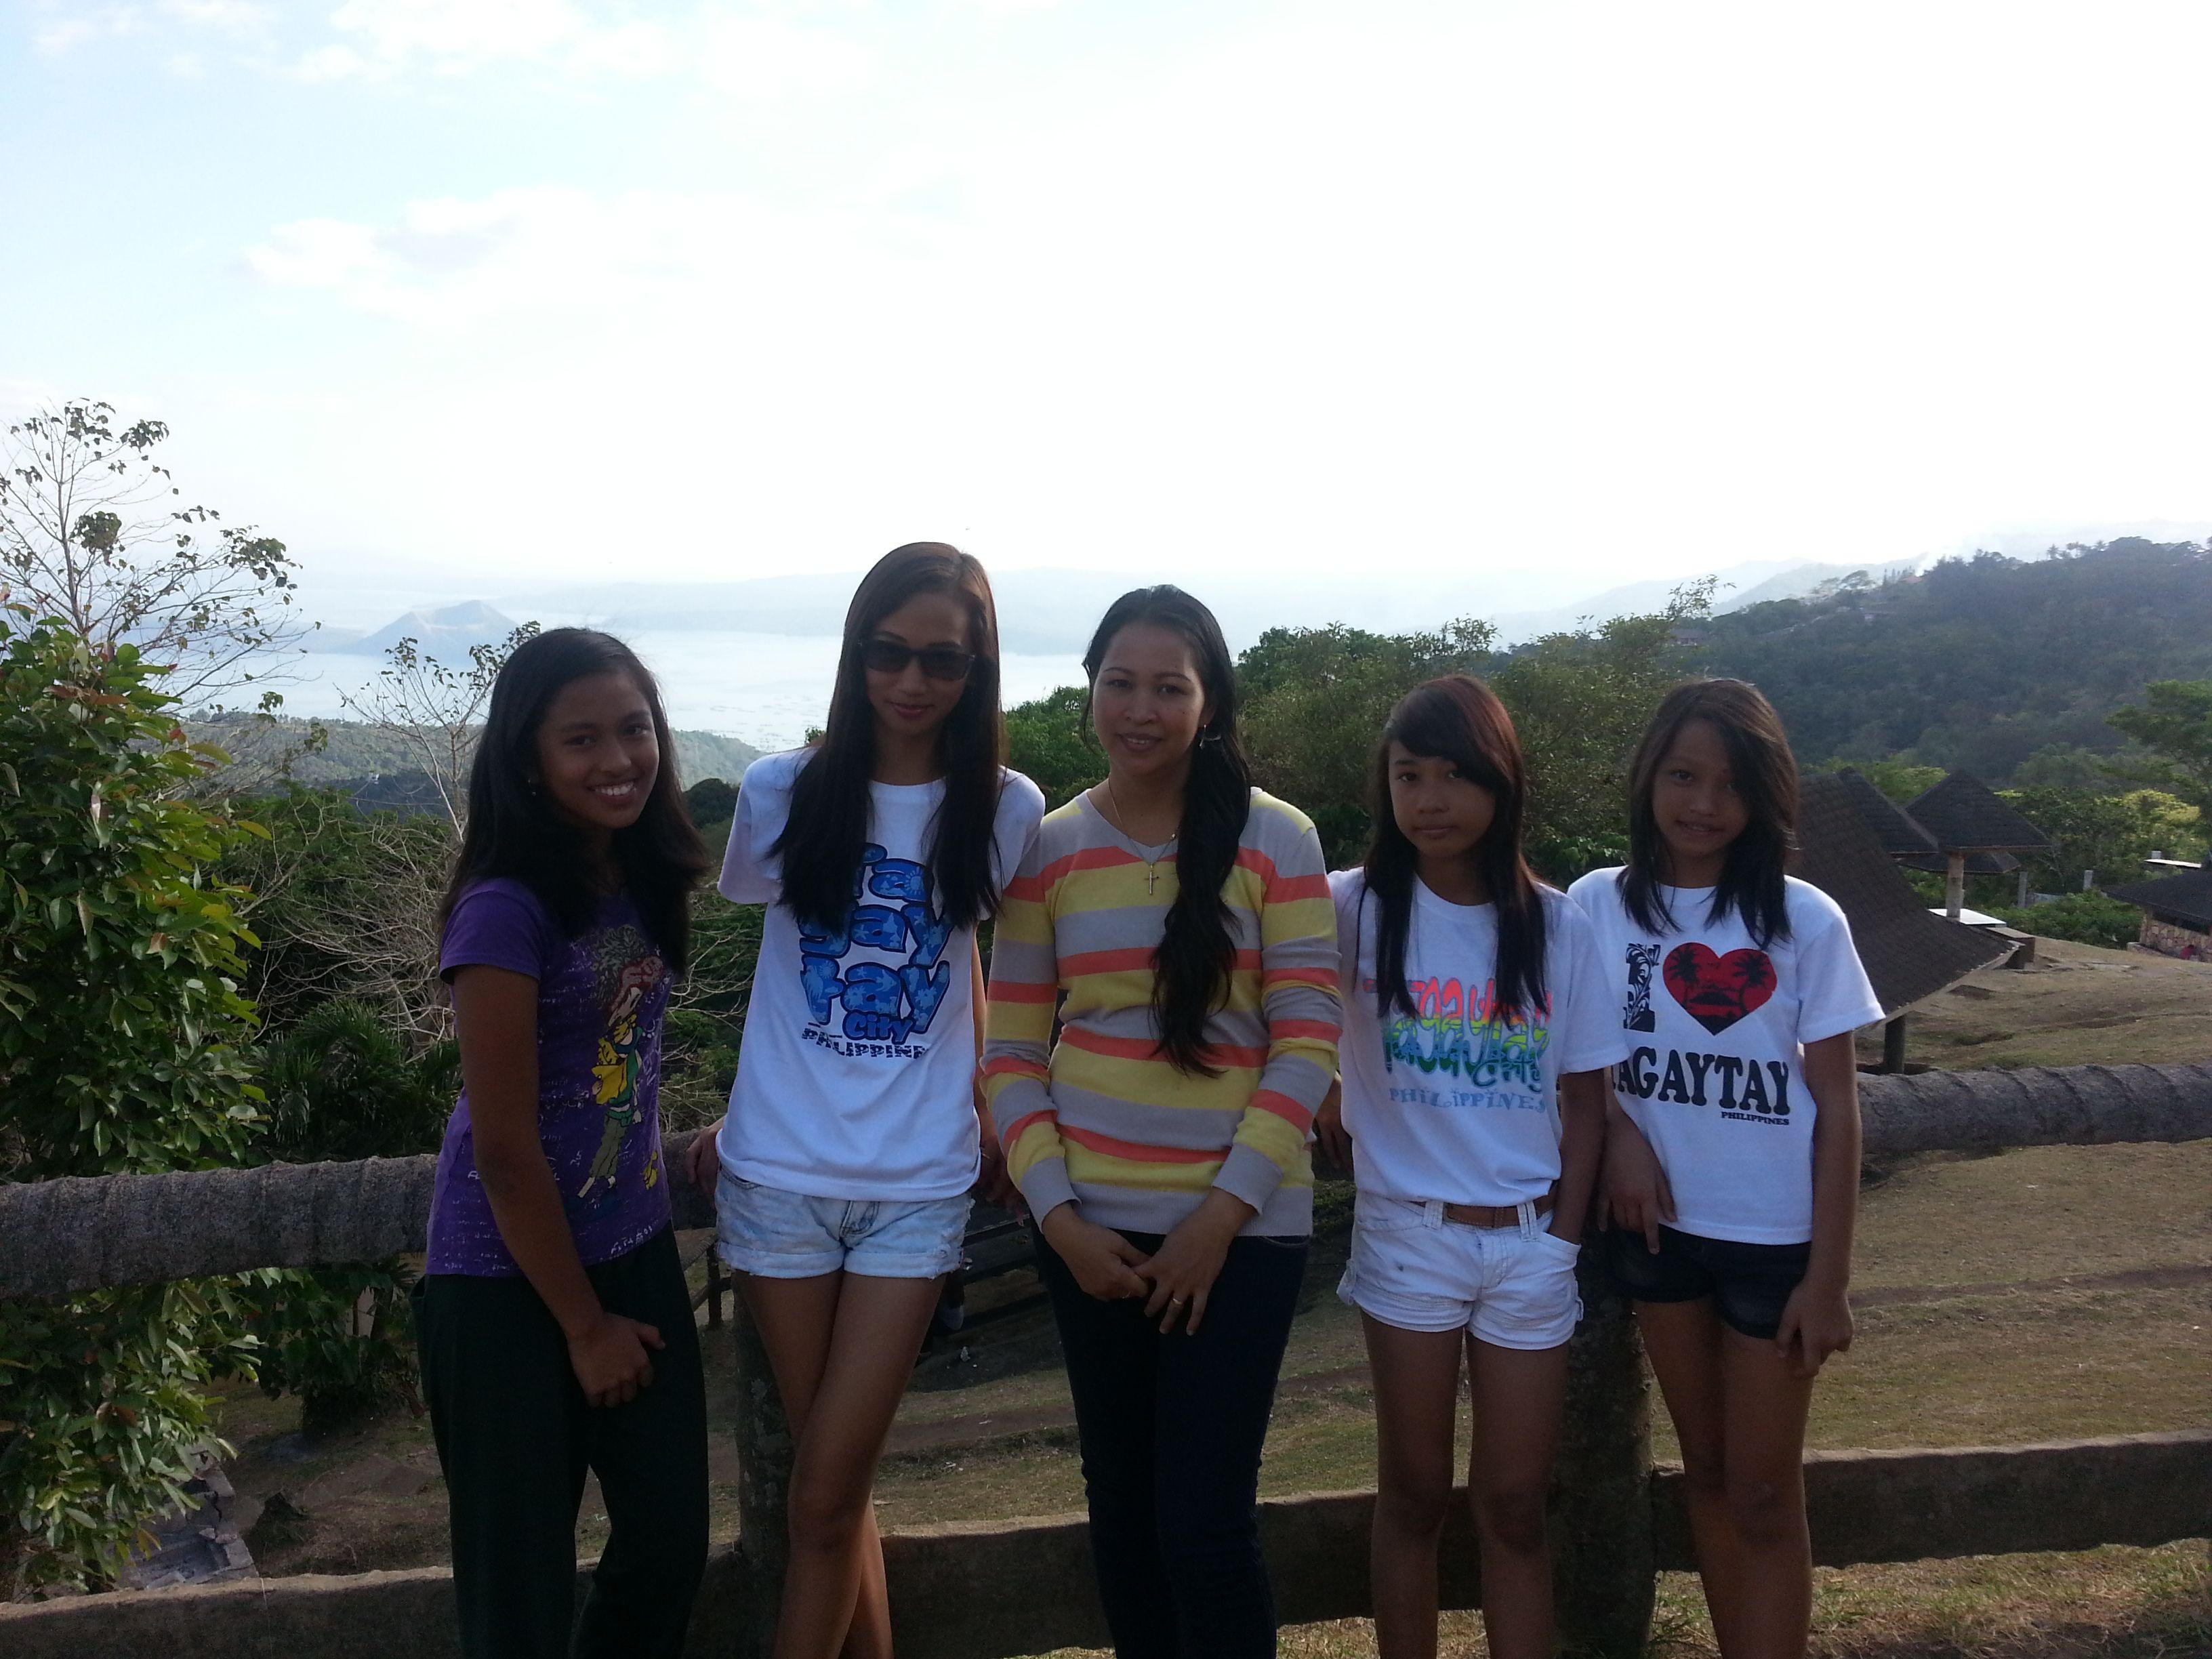 Albertos By Dj Seungli My Girls At Tagaytay Peoples Park Tagaytay Philippines